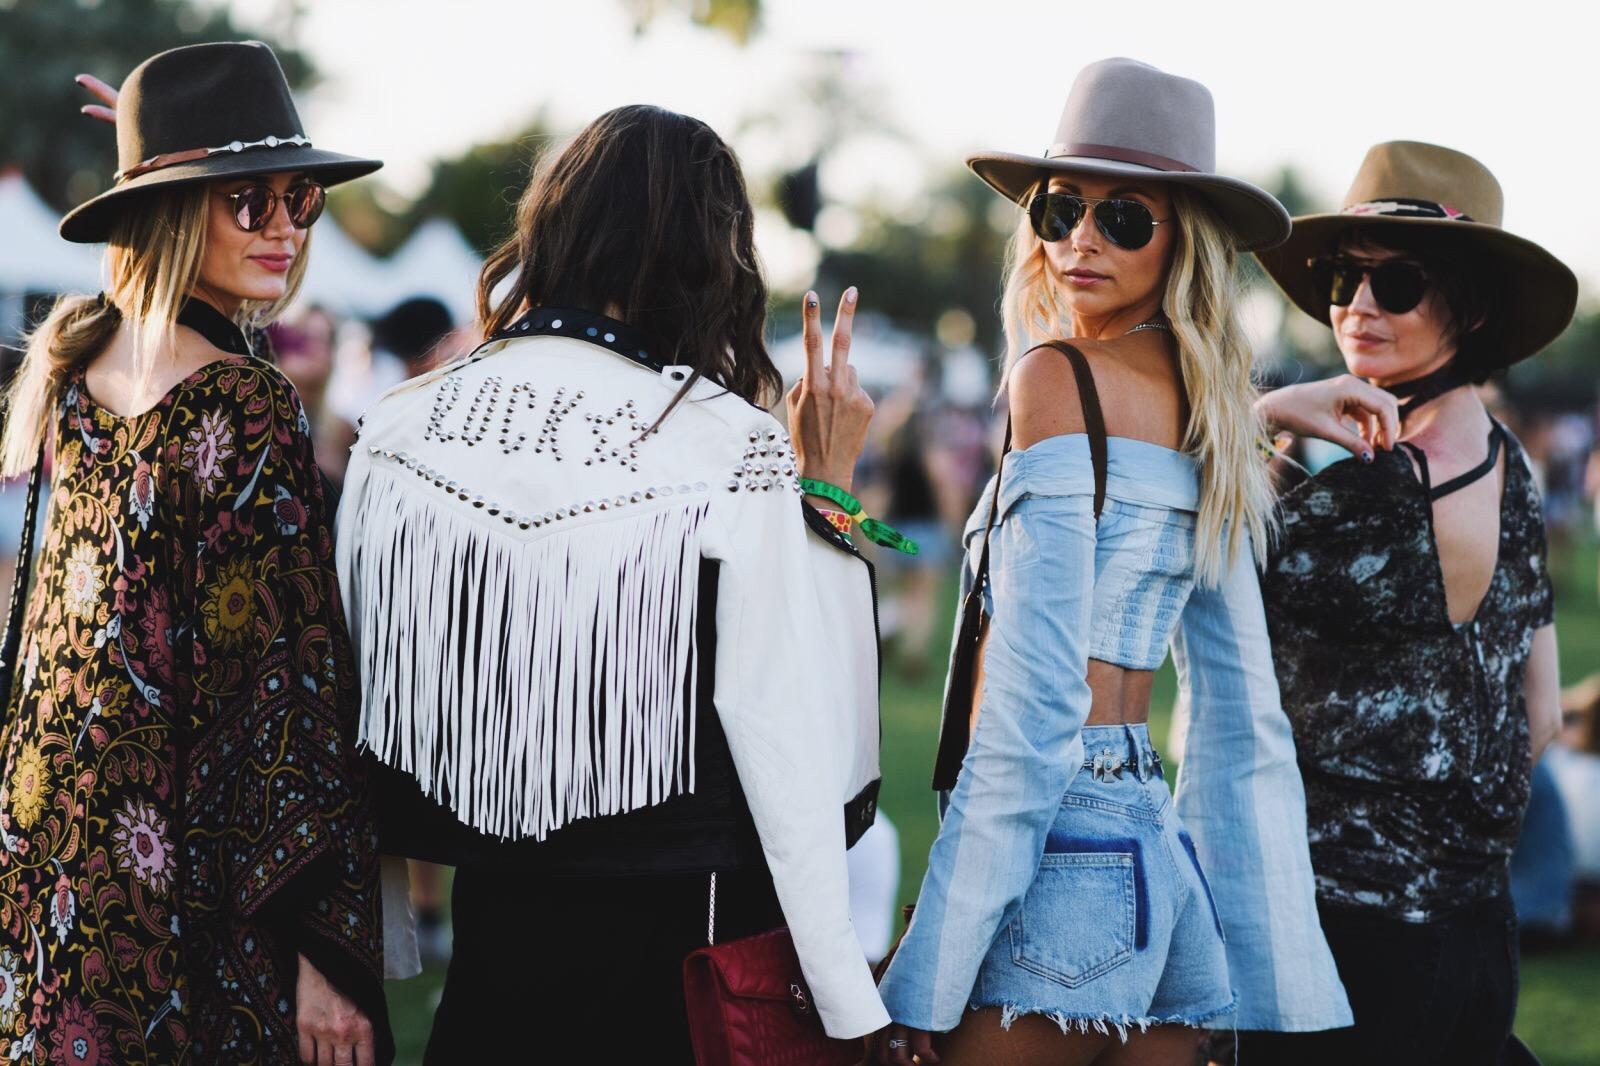 coachella street style girls outfits inspiration 2017